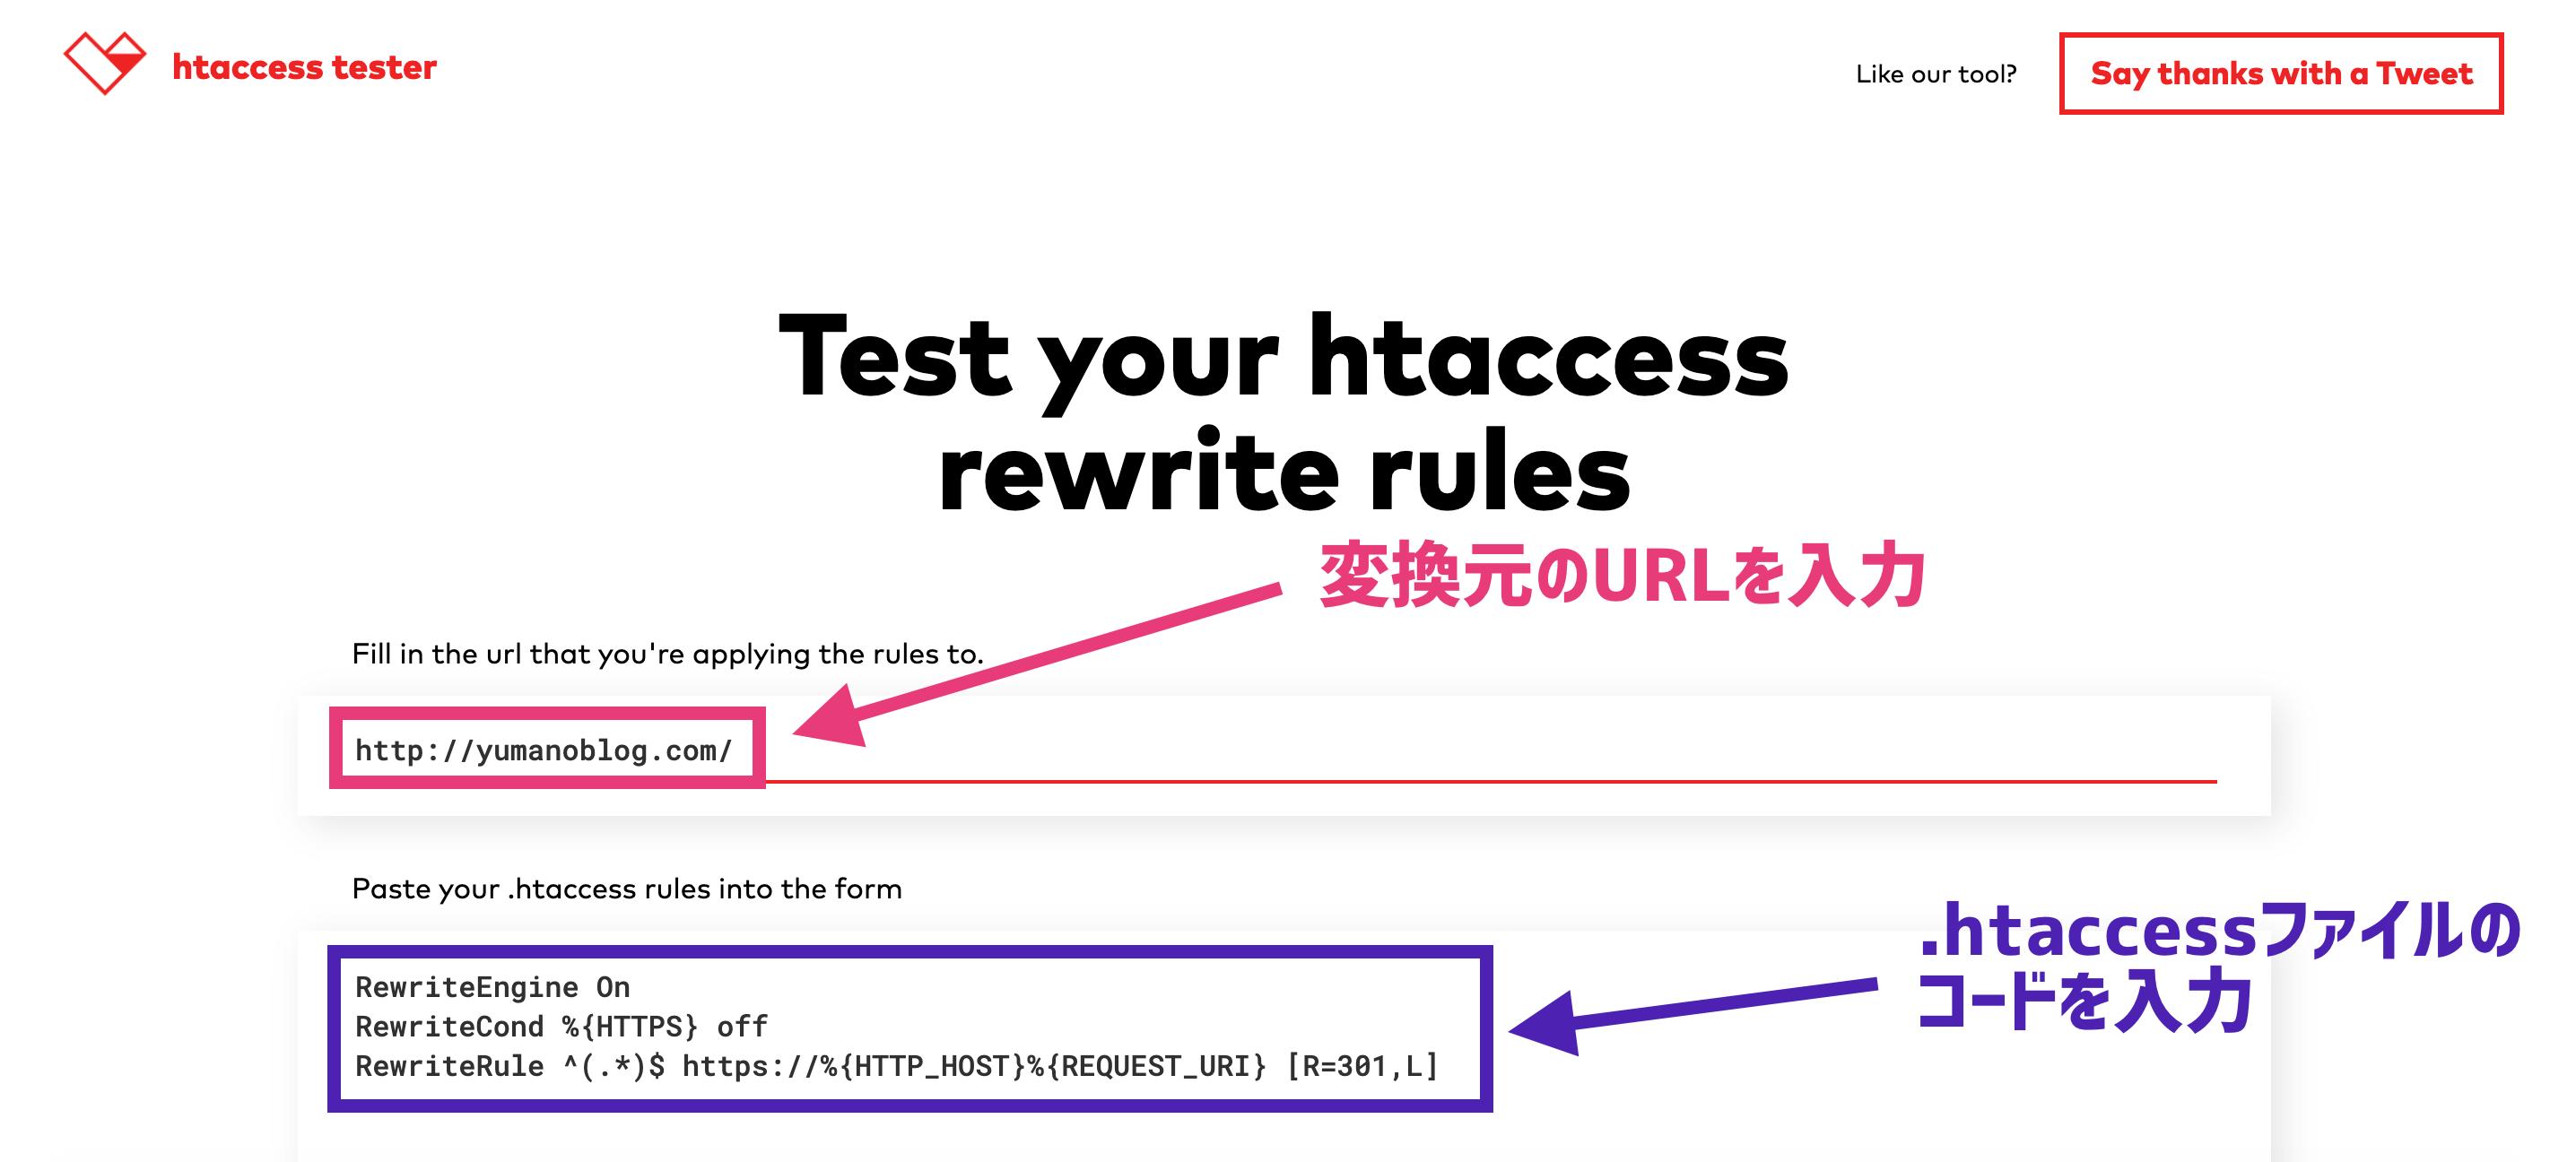 htaccess testerの使い方①